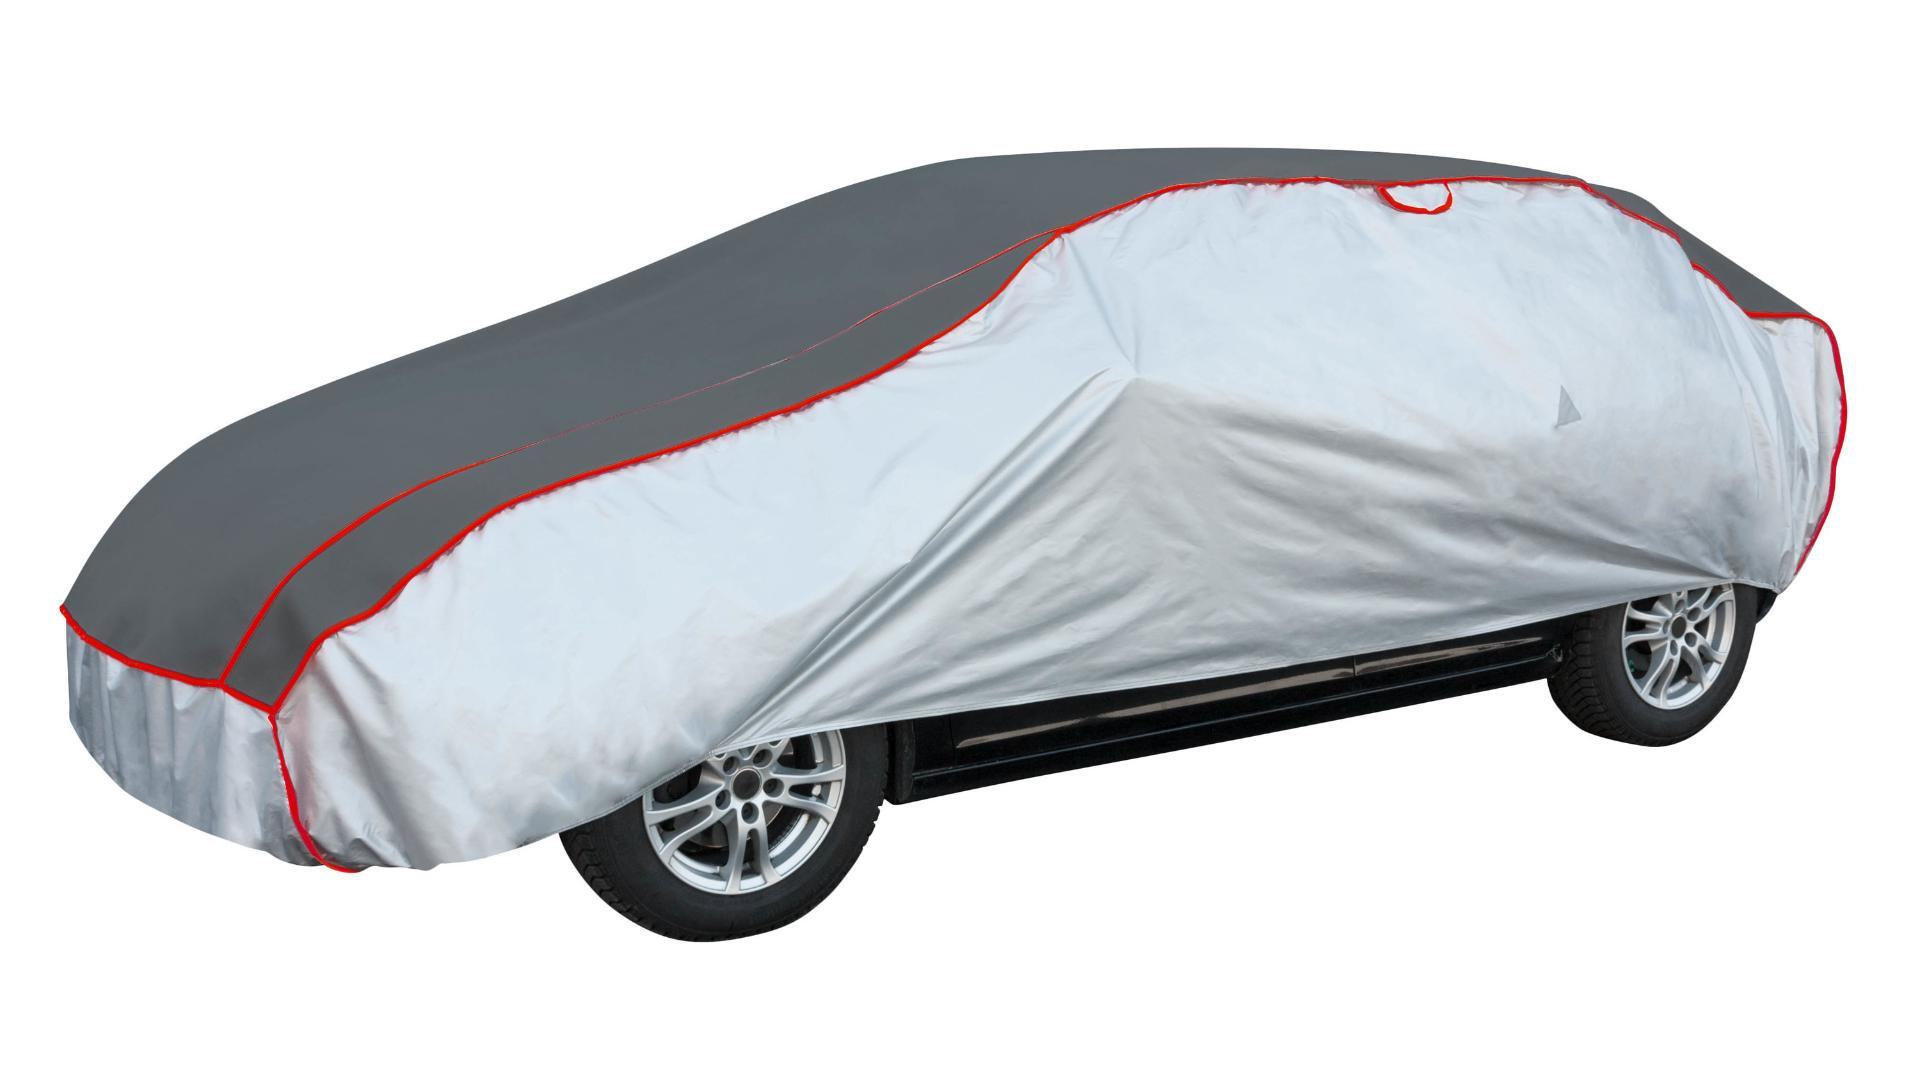 Walser plachta proti kroupám Premium Hybrid L 475x162,5x117,5cm